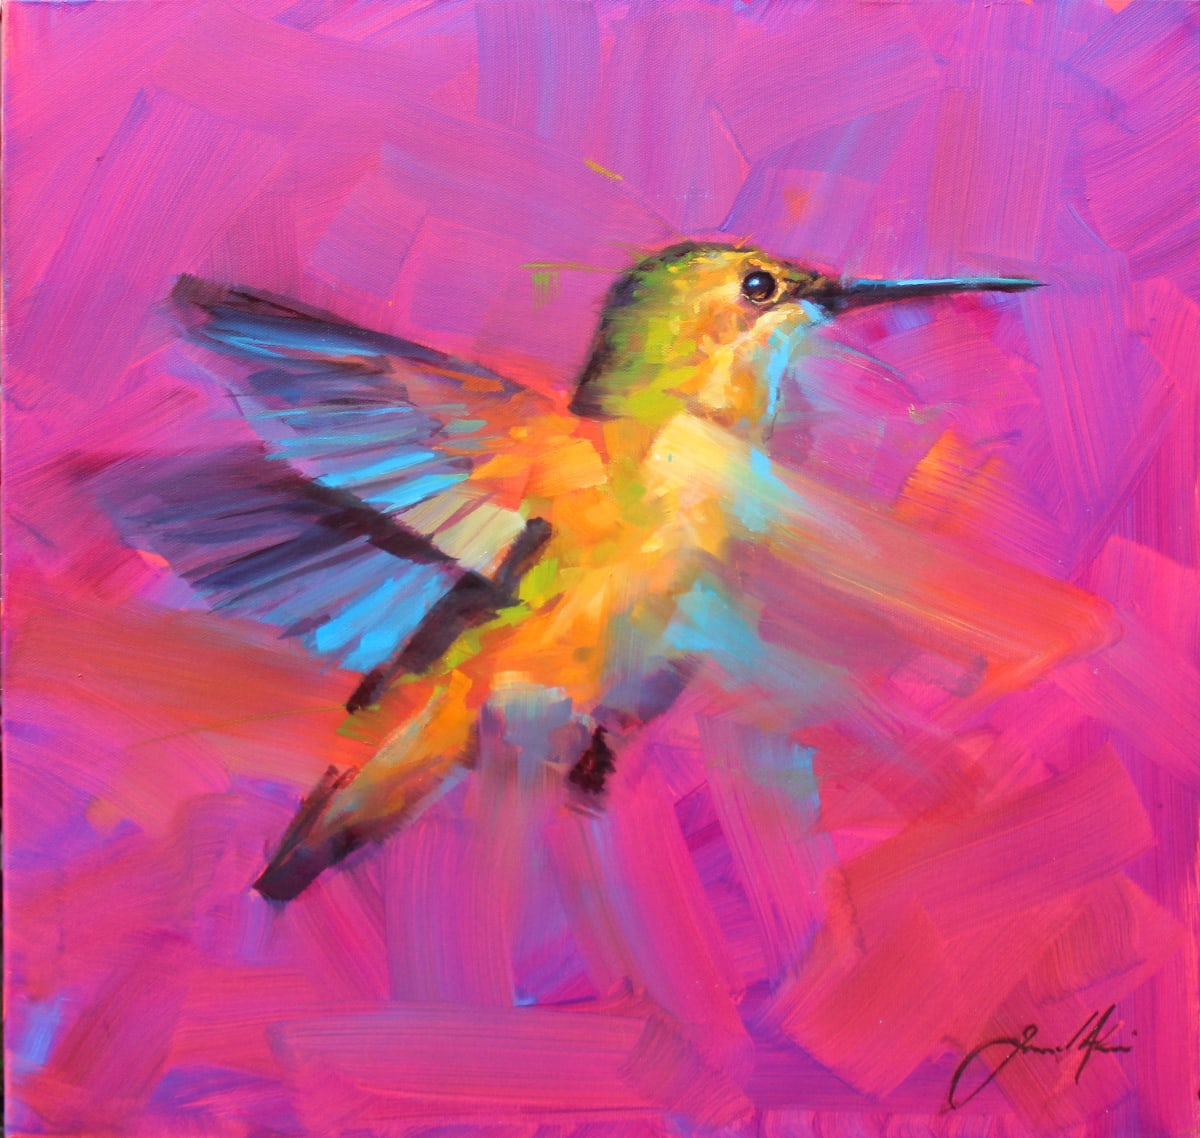 Jamel Akib Electric Hummingbird , 2019 Oil on Canvas 61 x 61 x 4 cm 24 1/8 x 24 1/8 x 1 5/8 in